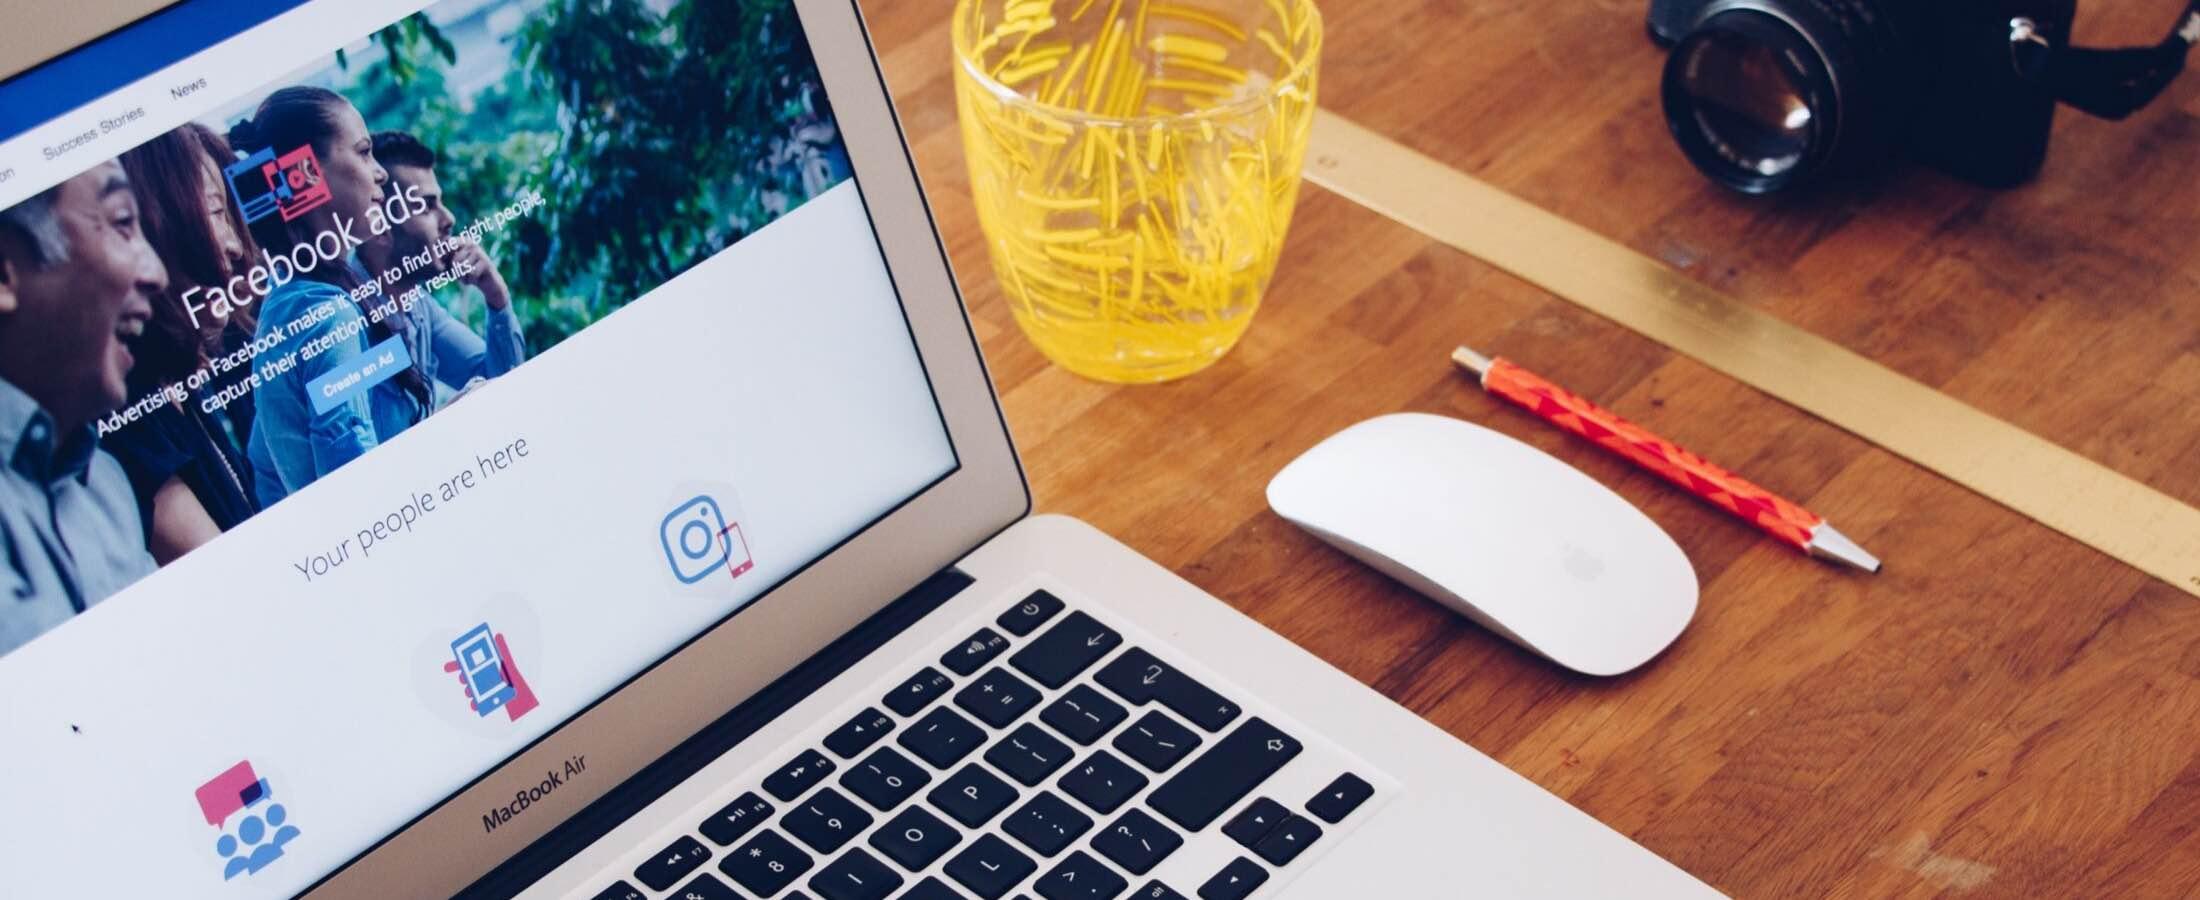 agence publicité digitale nantes facebook ads linkedin instagram pixel expert objectifs